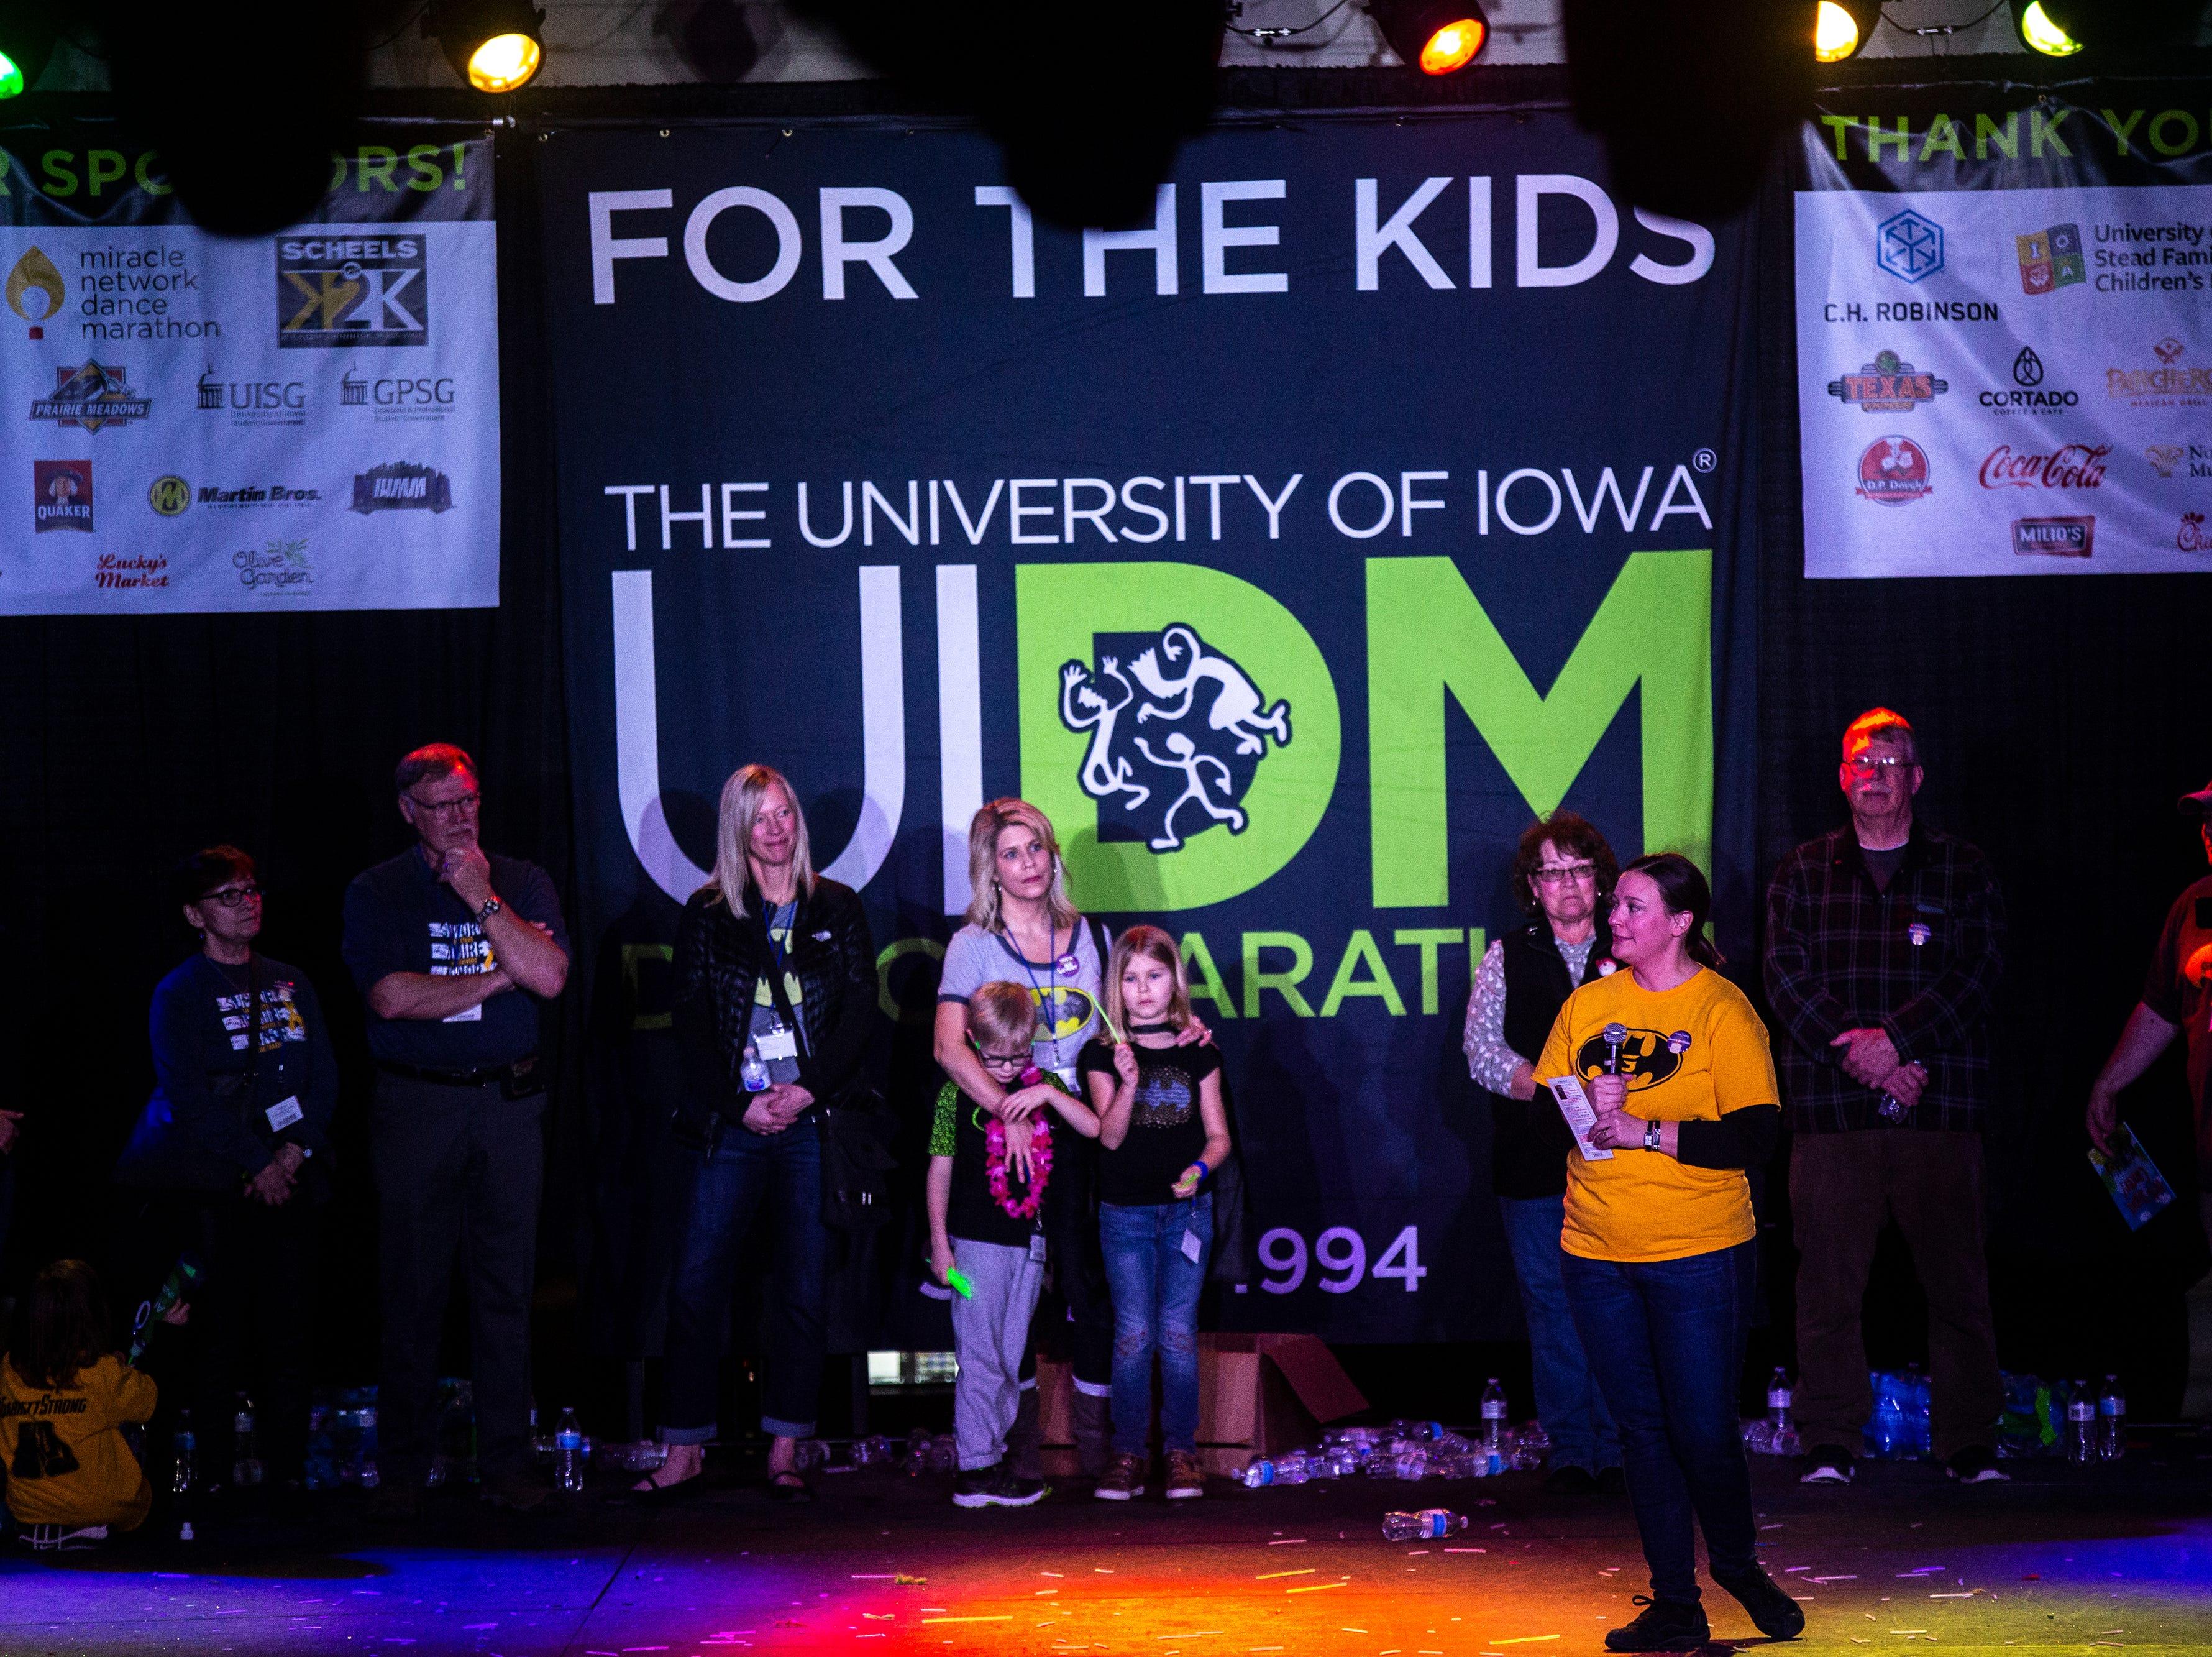 Emilie Matthias speaks during the University of Iowa Dance Marathon 25 on Saturday, Feb. 2, 2019, at the Iowa Memorial Union in Iowa City, Iowa. Her five-year-old Garrett died on July 6, 2018.